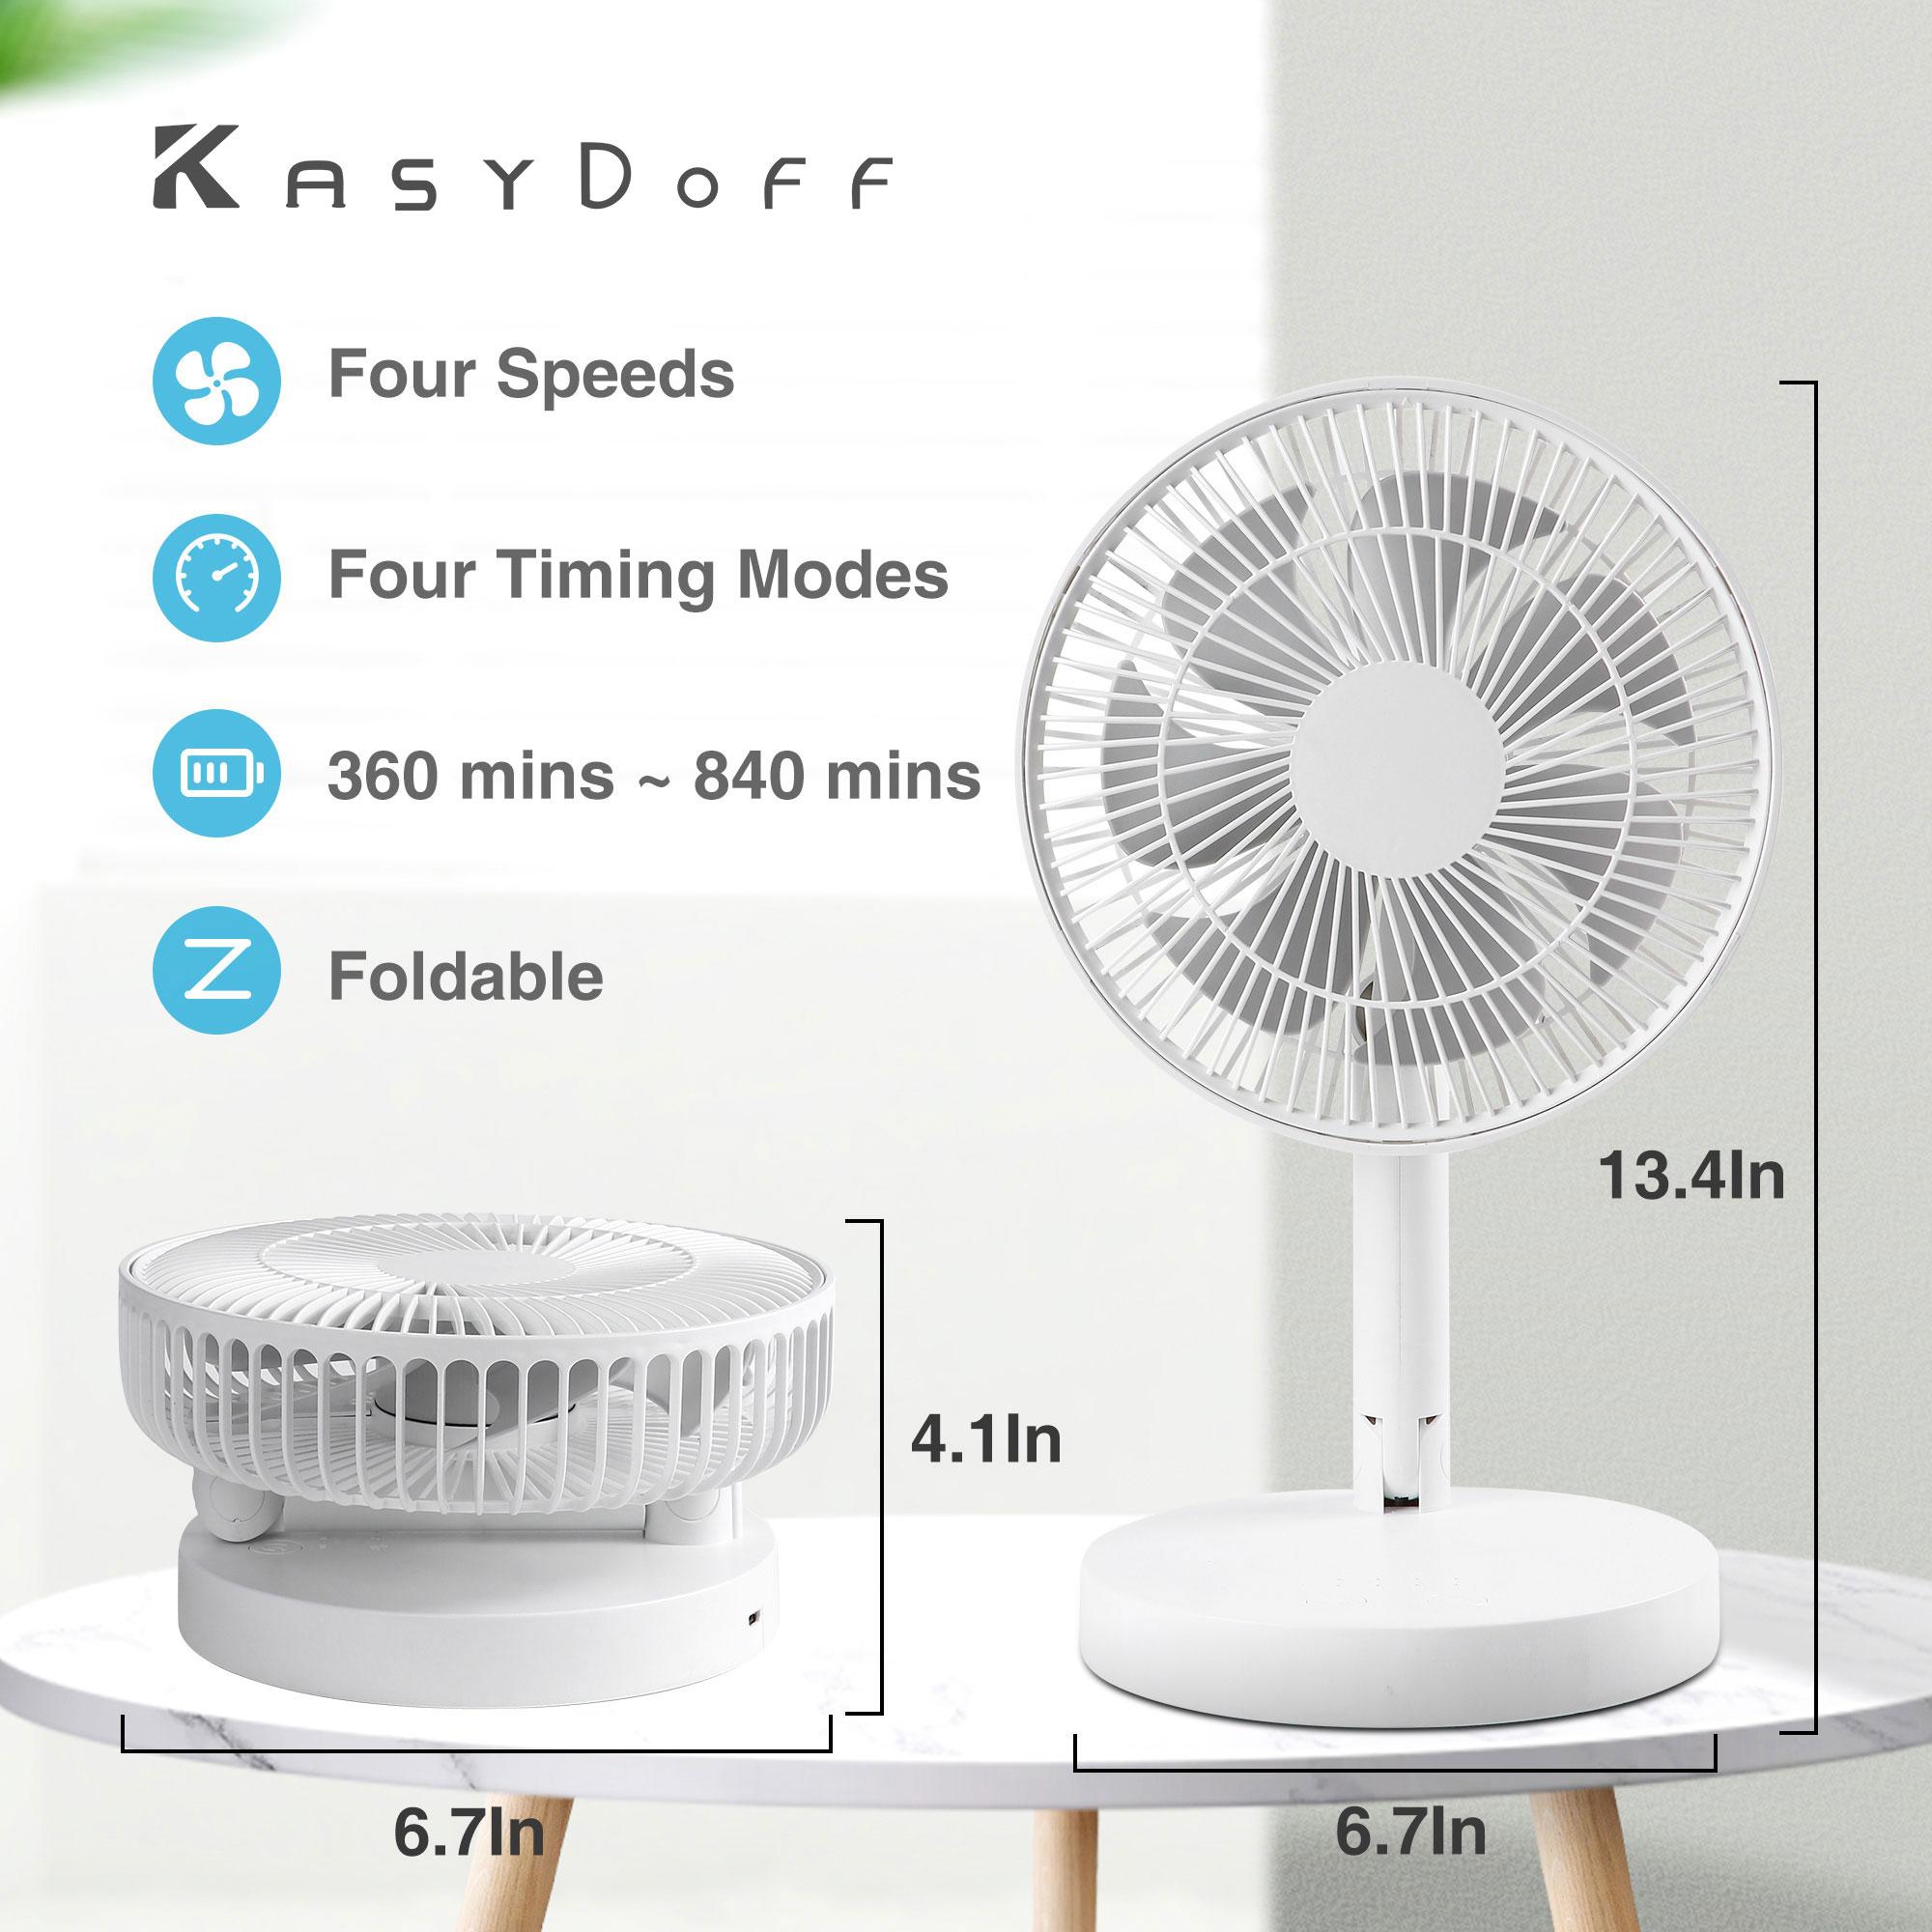 KASYDoFF USB قابل لإعادة الشحن مروحة مكتب ، 7200mAh المحمولة خلاط قائم صغير مروحة التبريد مروحة صغيرة قابلة للطي لمكتب المنزل مكتب وغرفة نوم